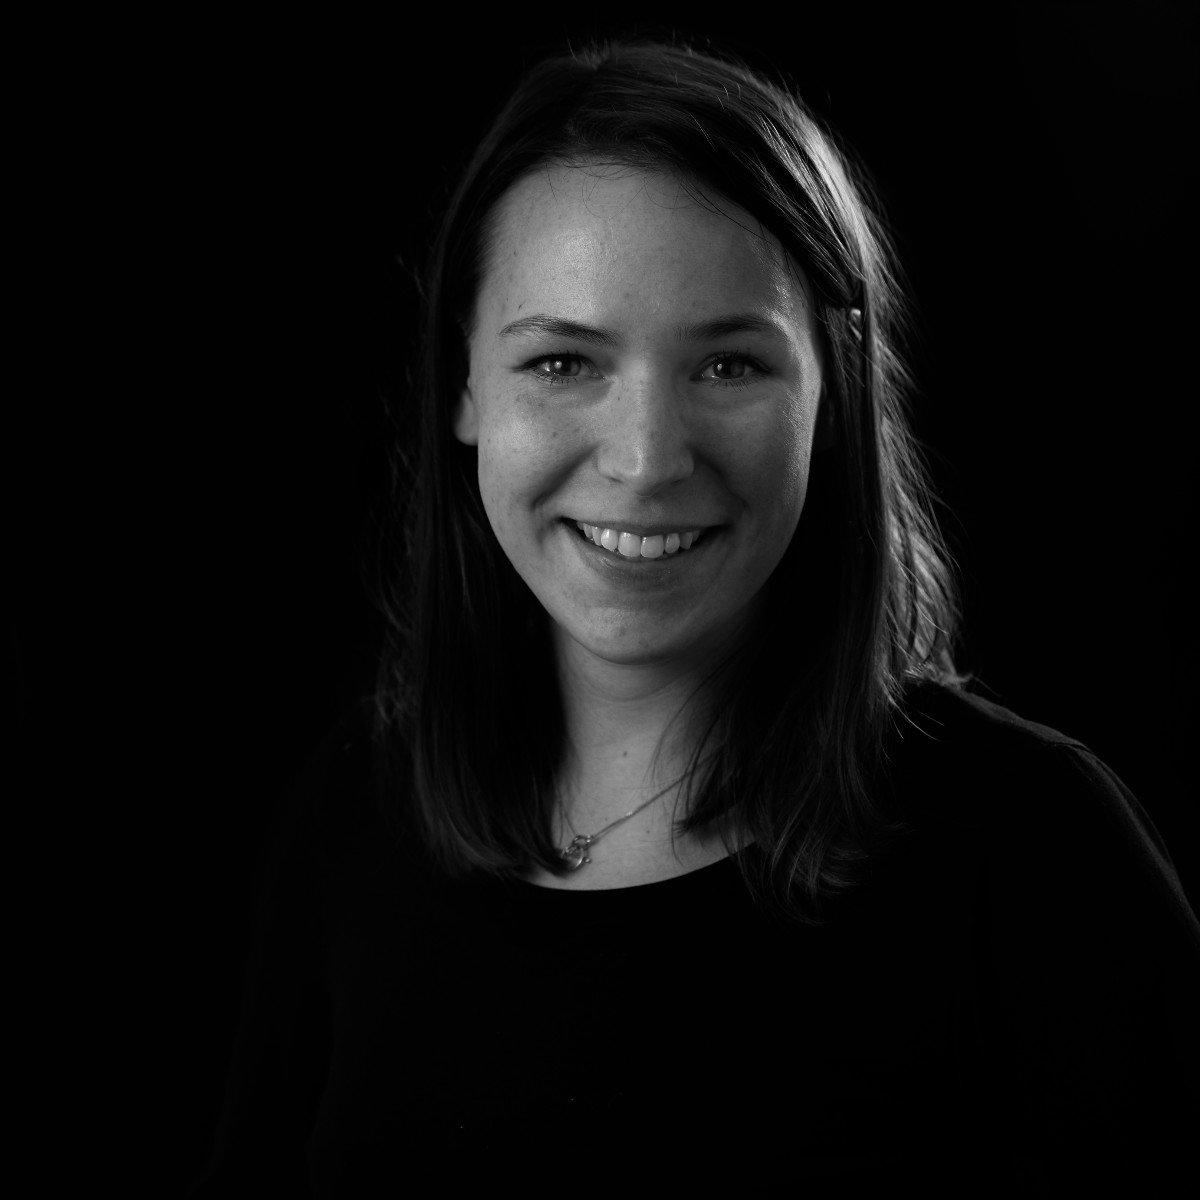 Alina Schlingmann